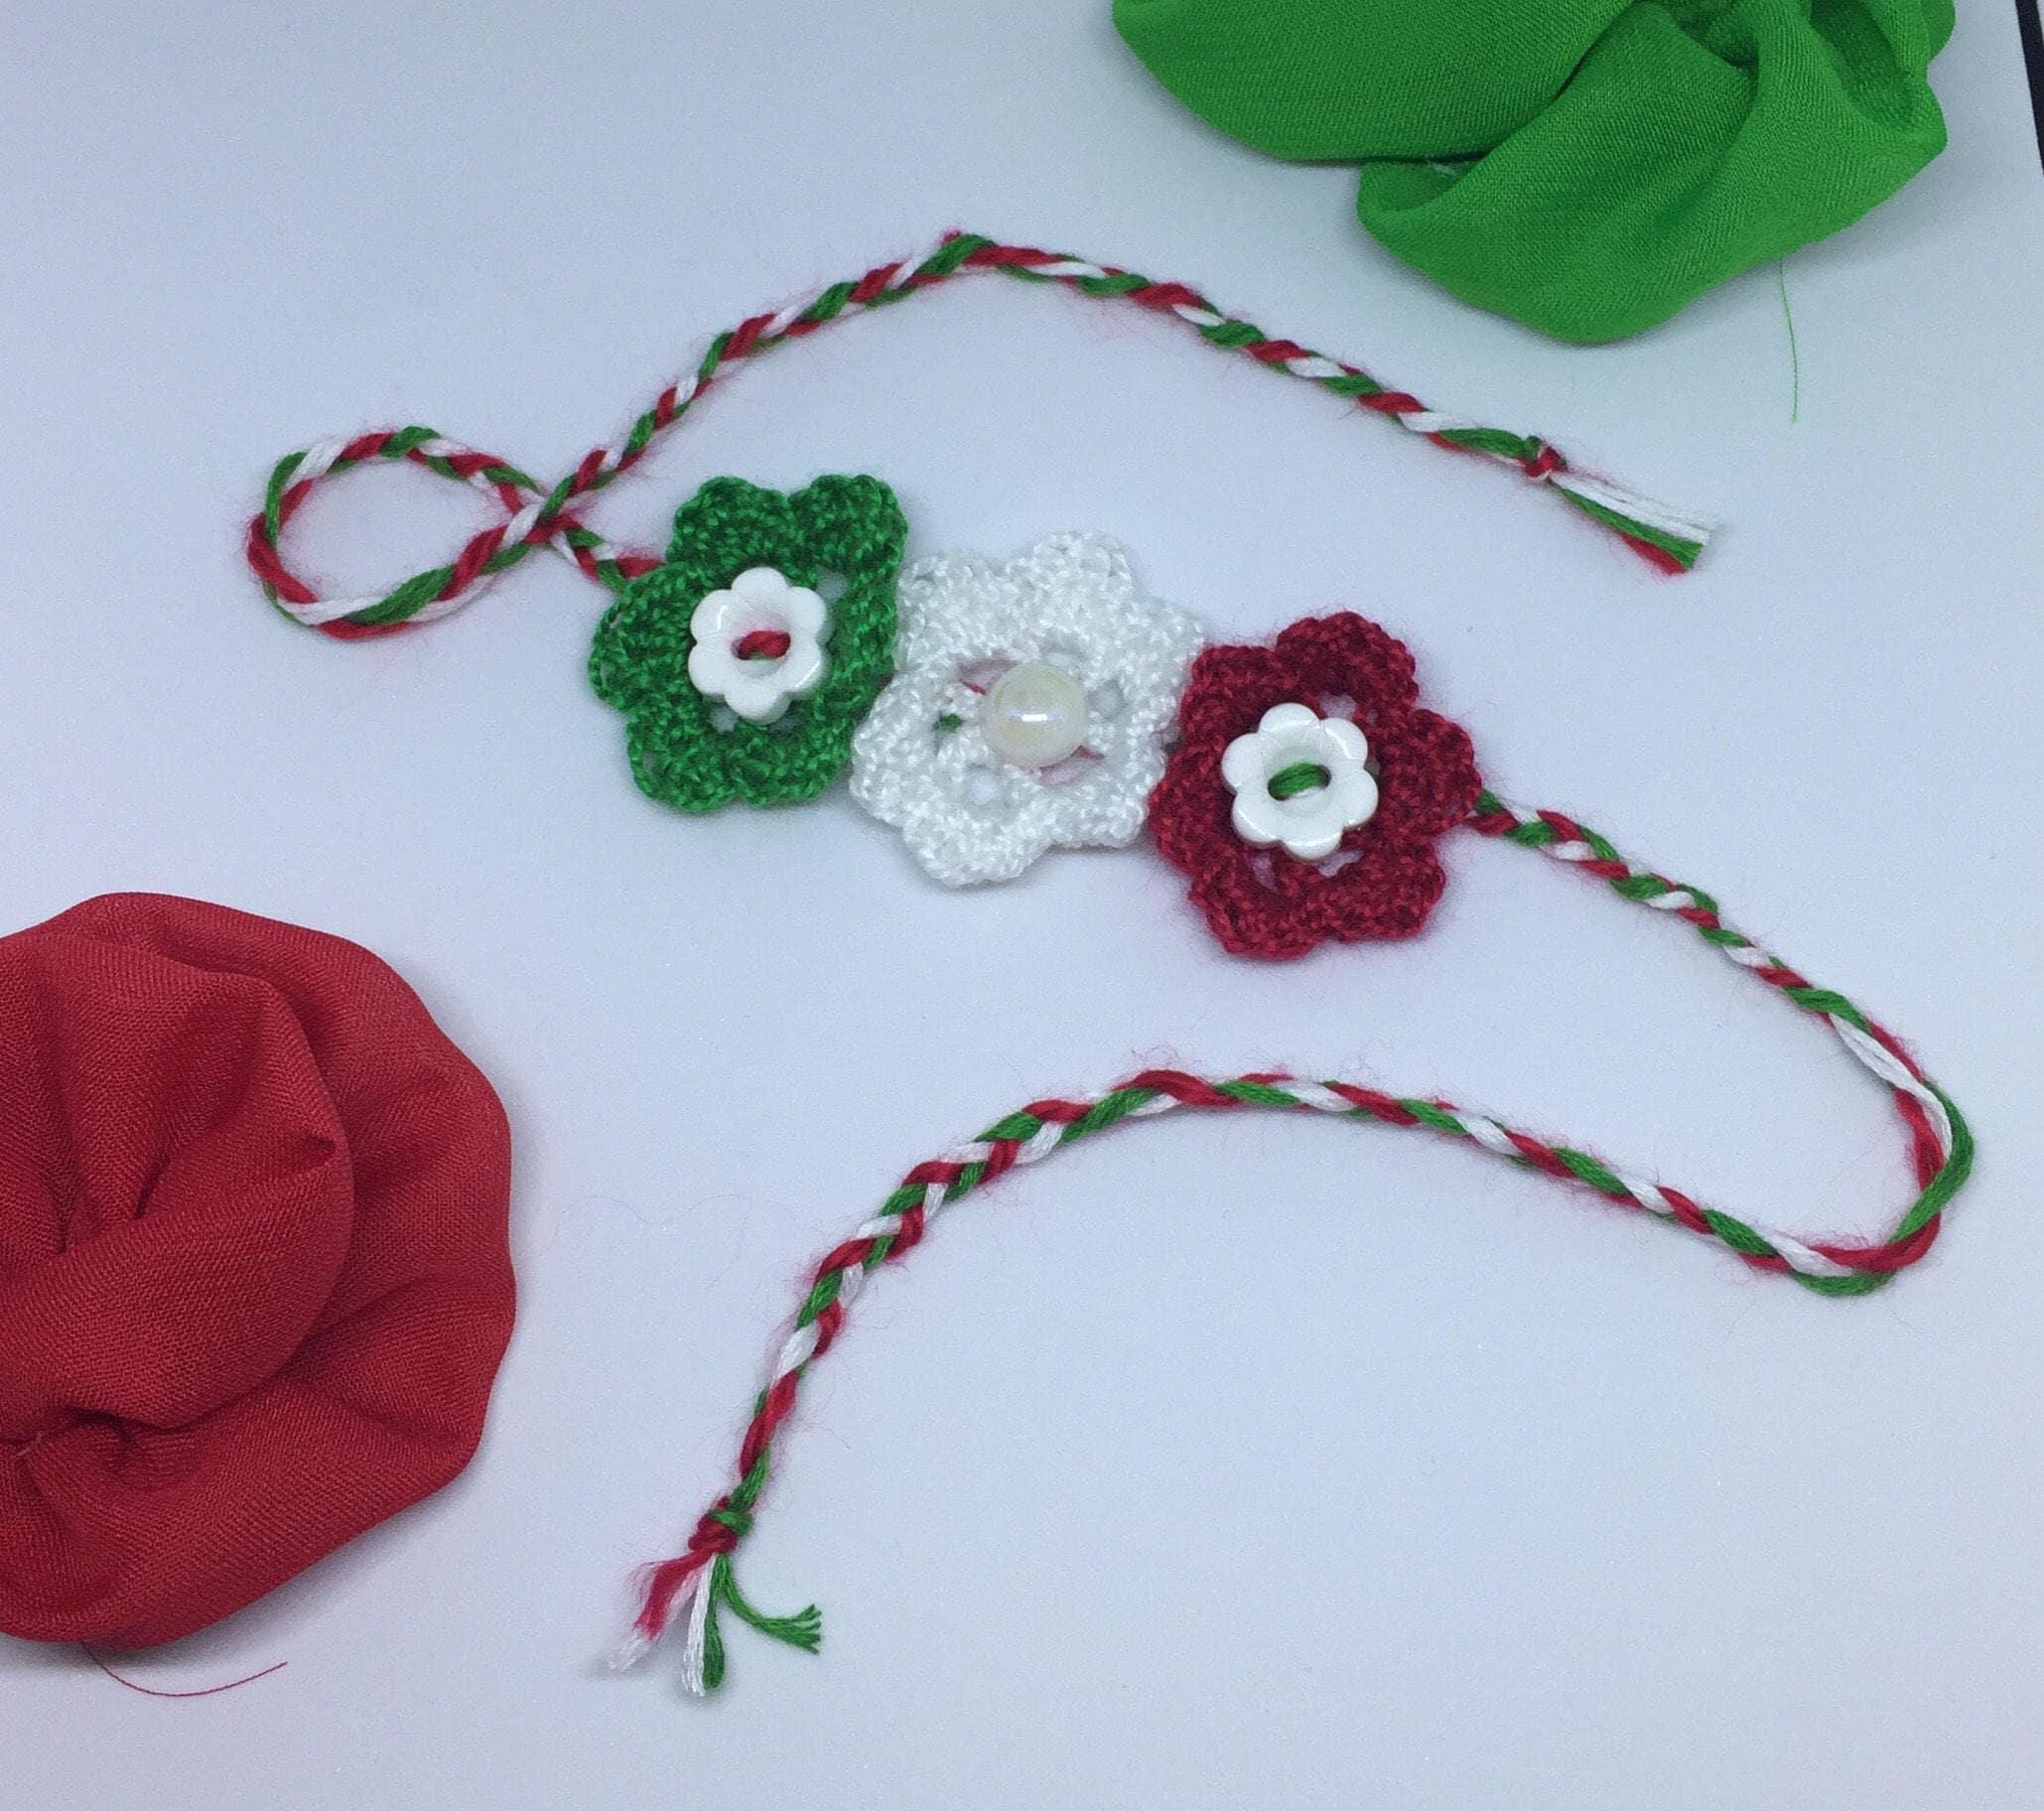 baby newborn mexico flag colors headband handmade crochet